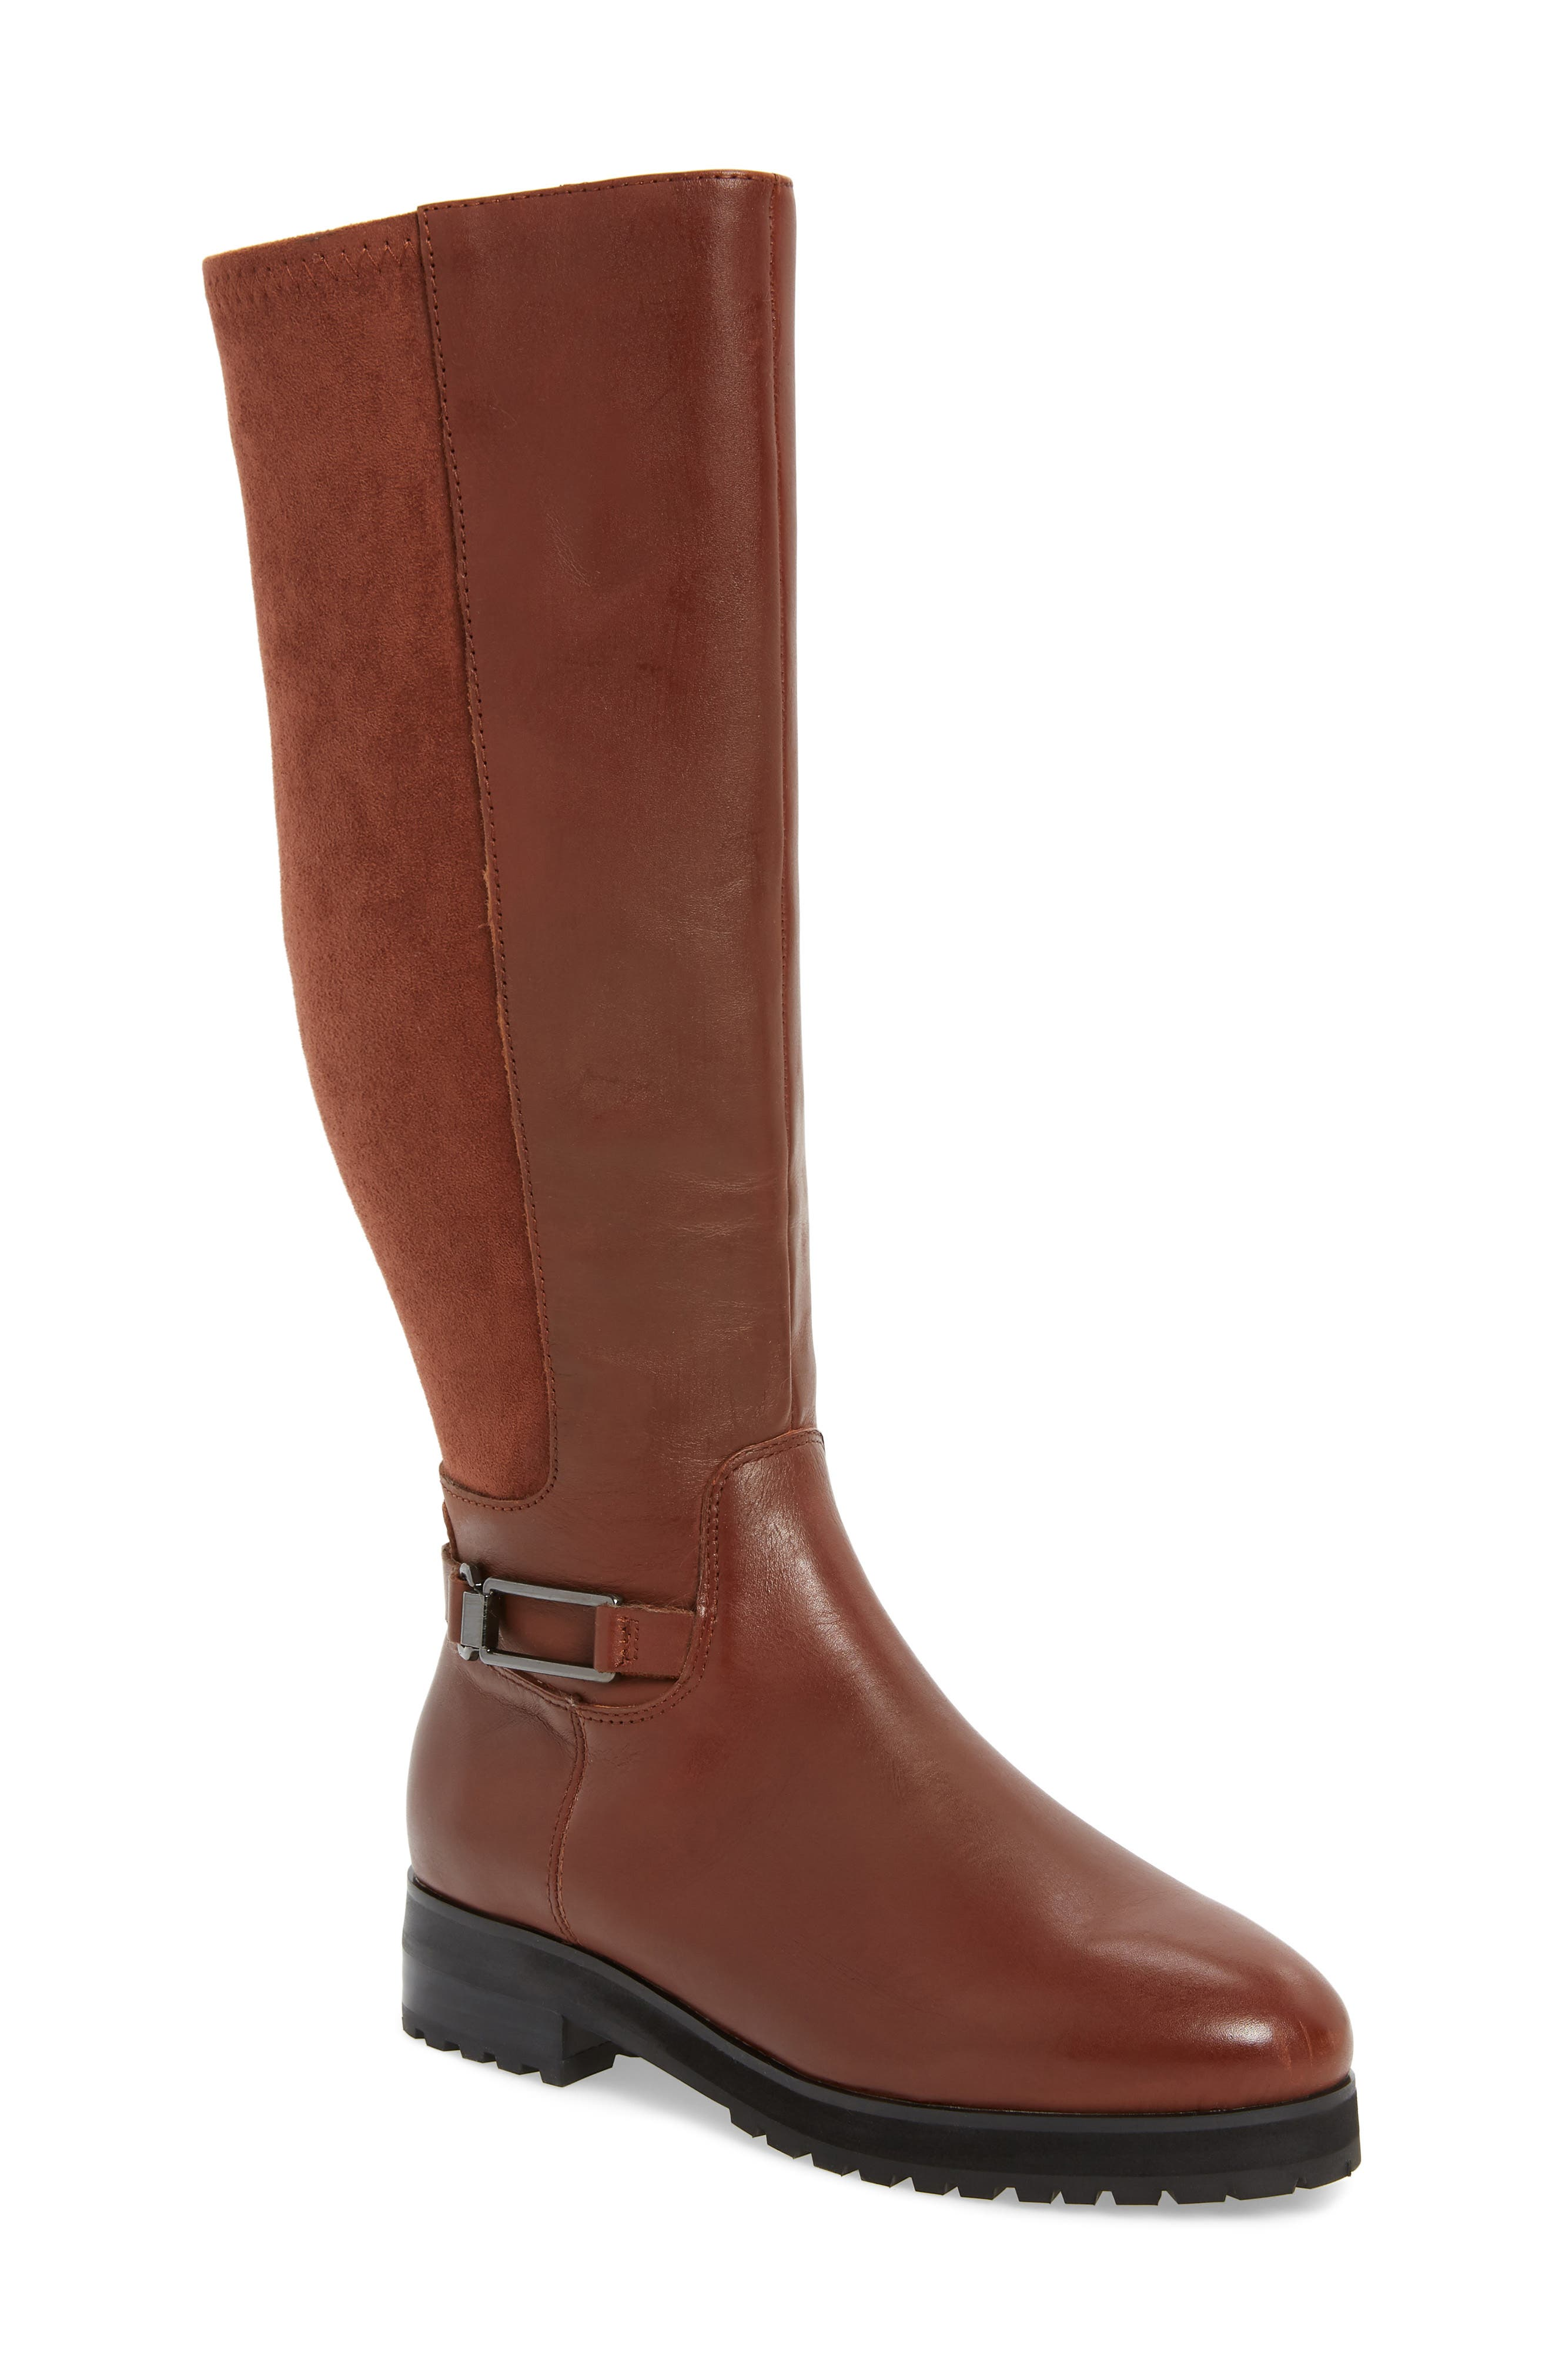 Frida Waterproof Knee High Boot,                         Main,                         color, COGNAC